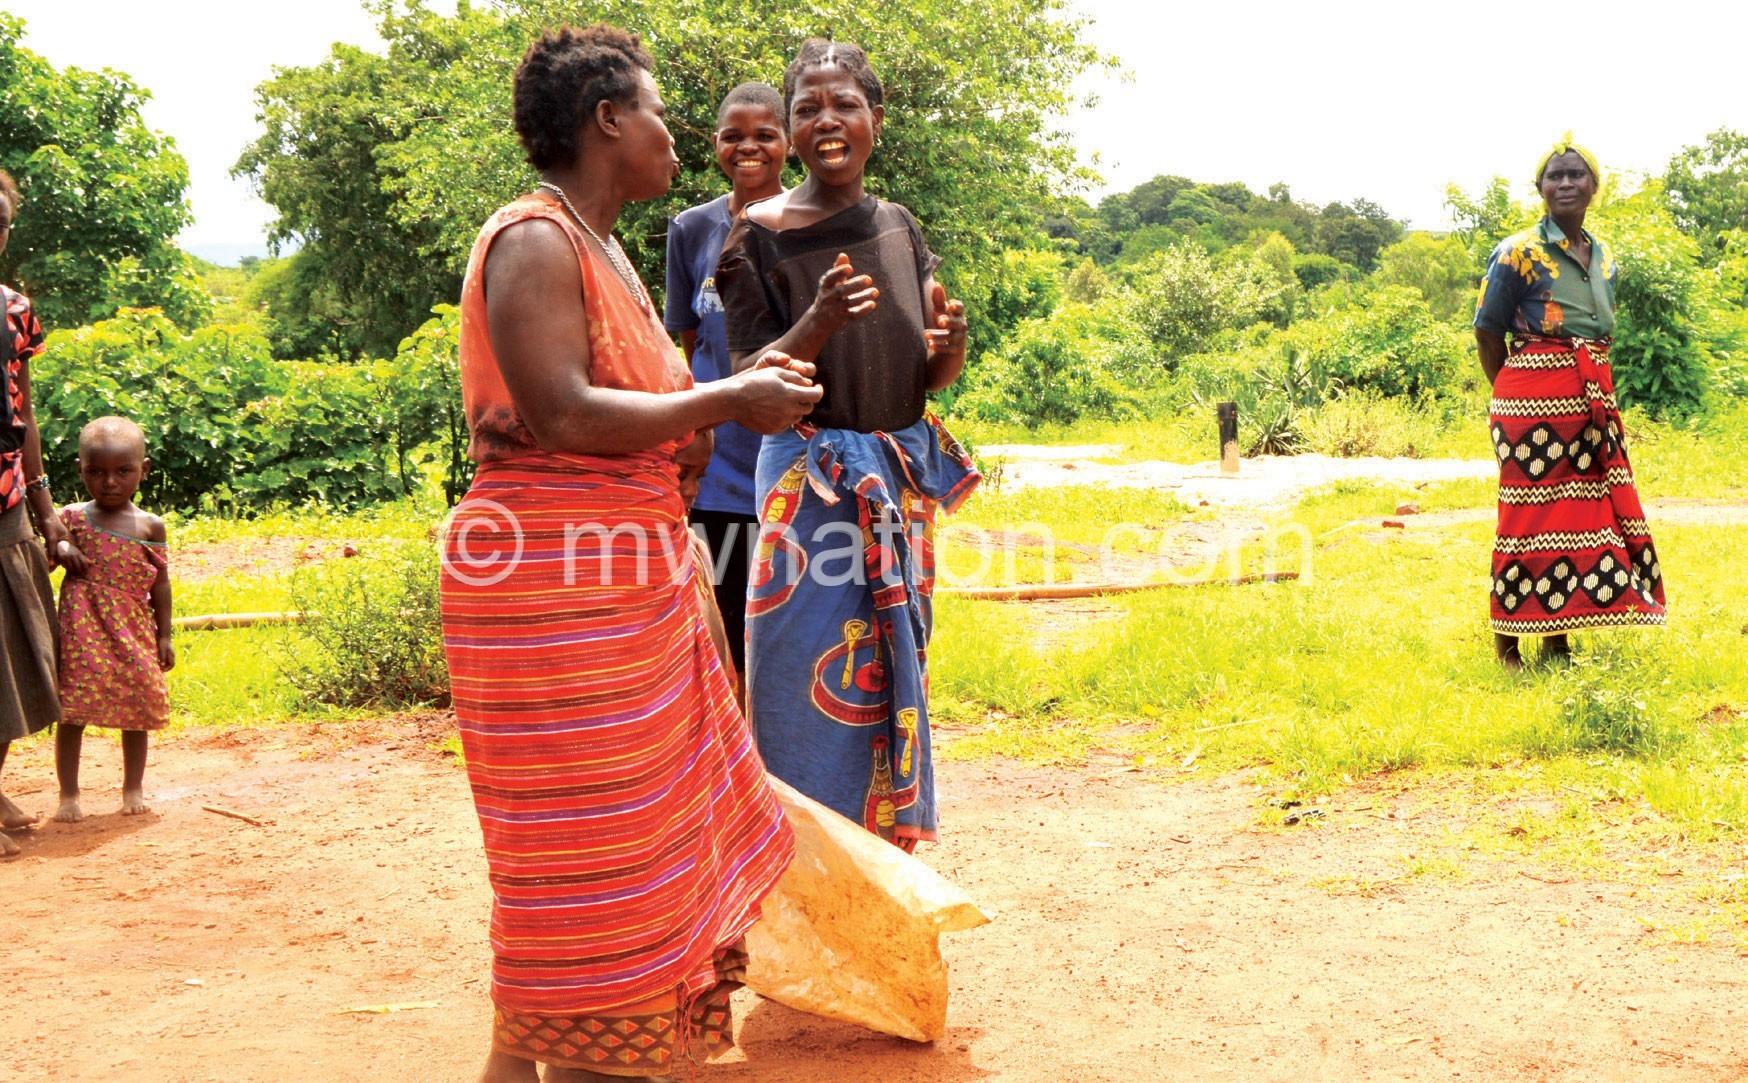 malingunde | The Nation Online